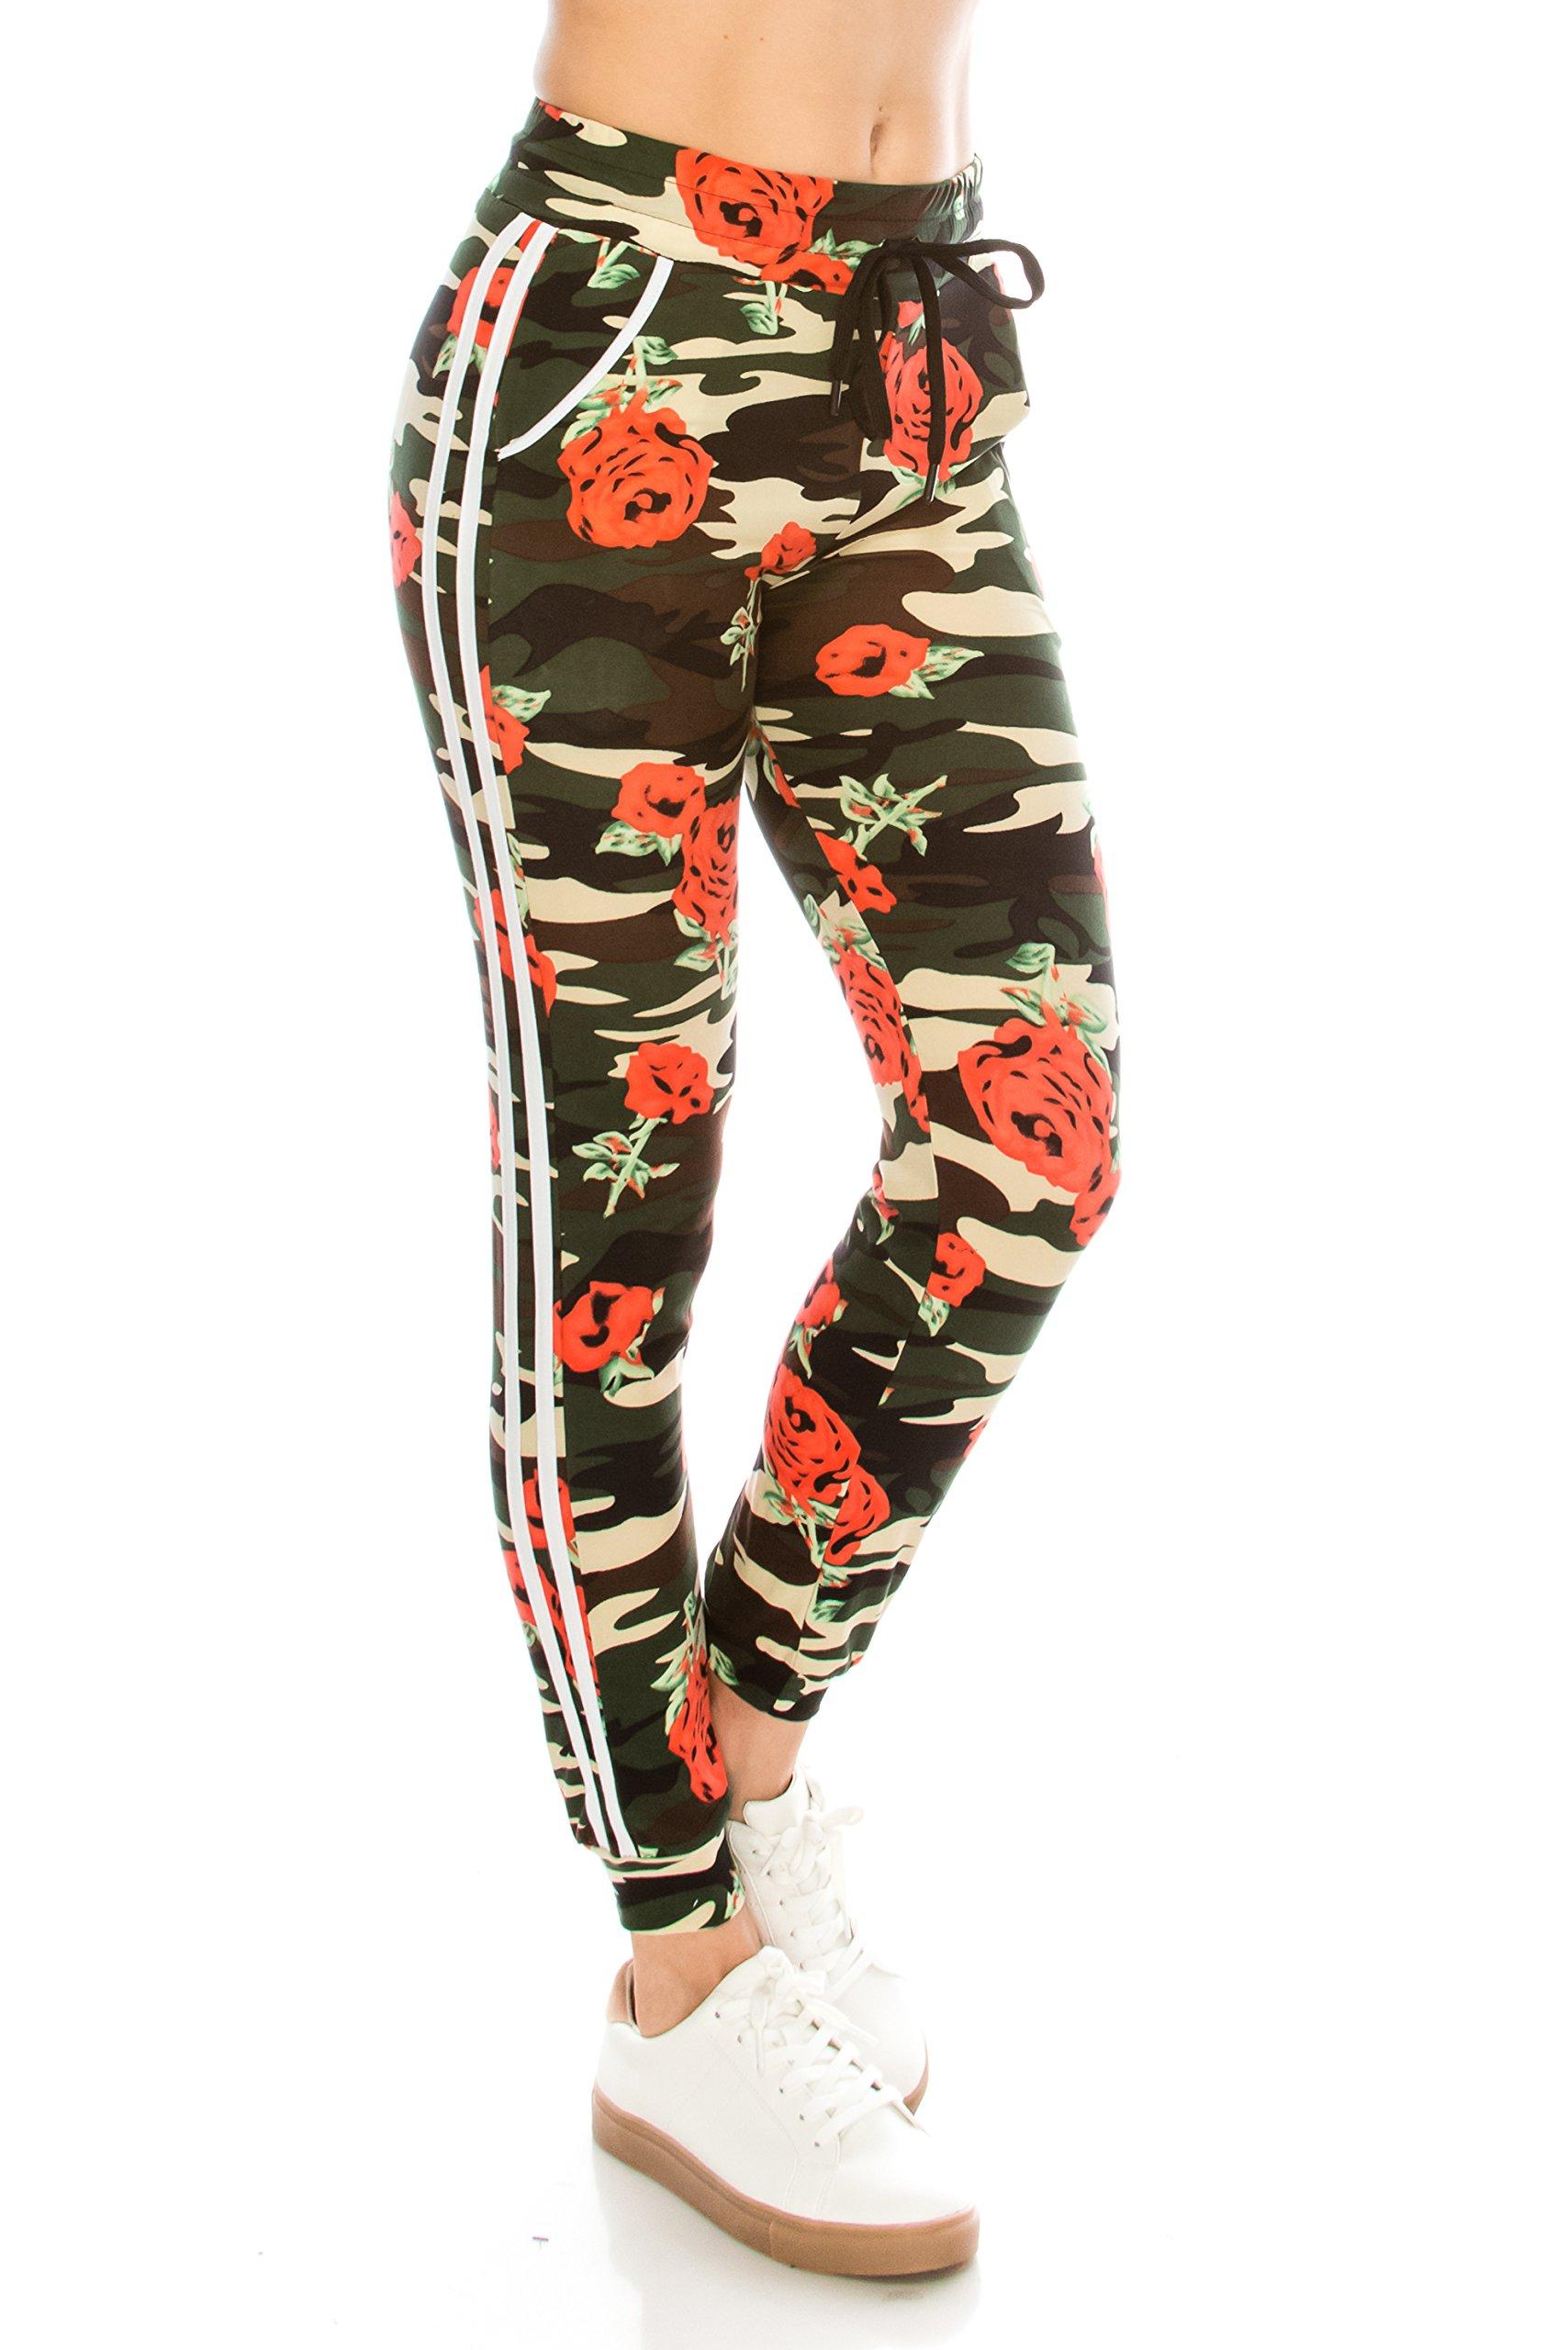 ALWAYS Women Drawstrings Jogger Sweatpants - Skinny Camo Soft Pockets Pants L/XL